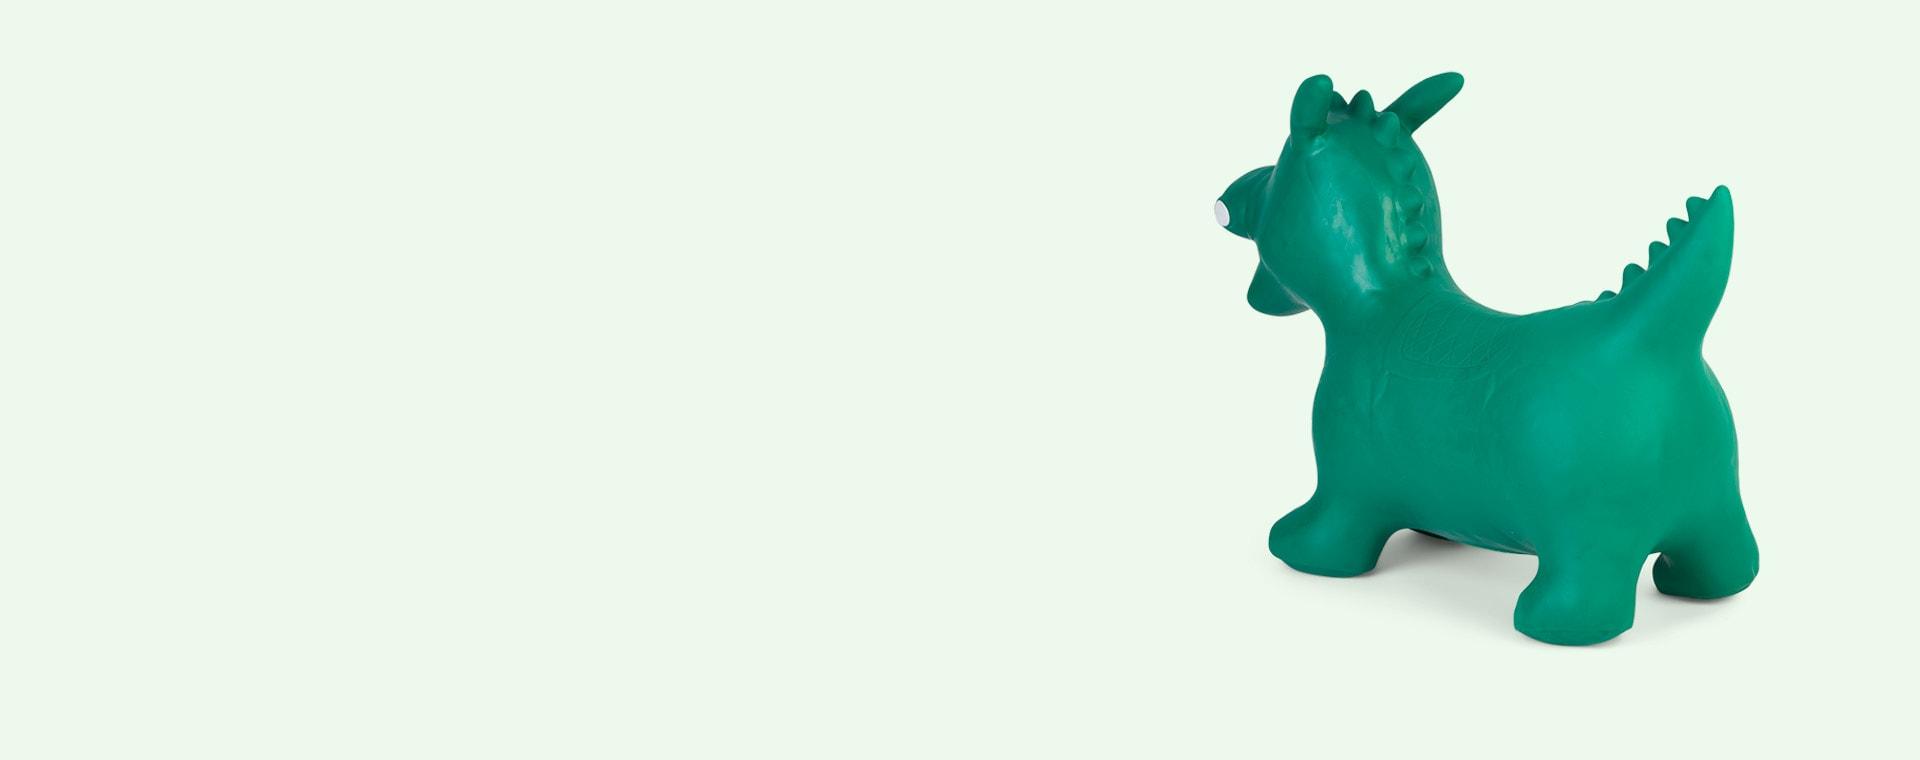 Green Happy Hopperz Green Dino